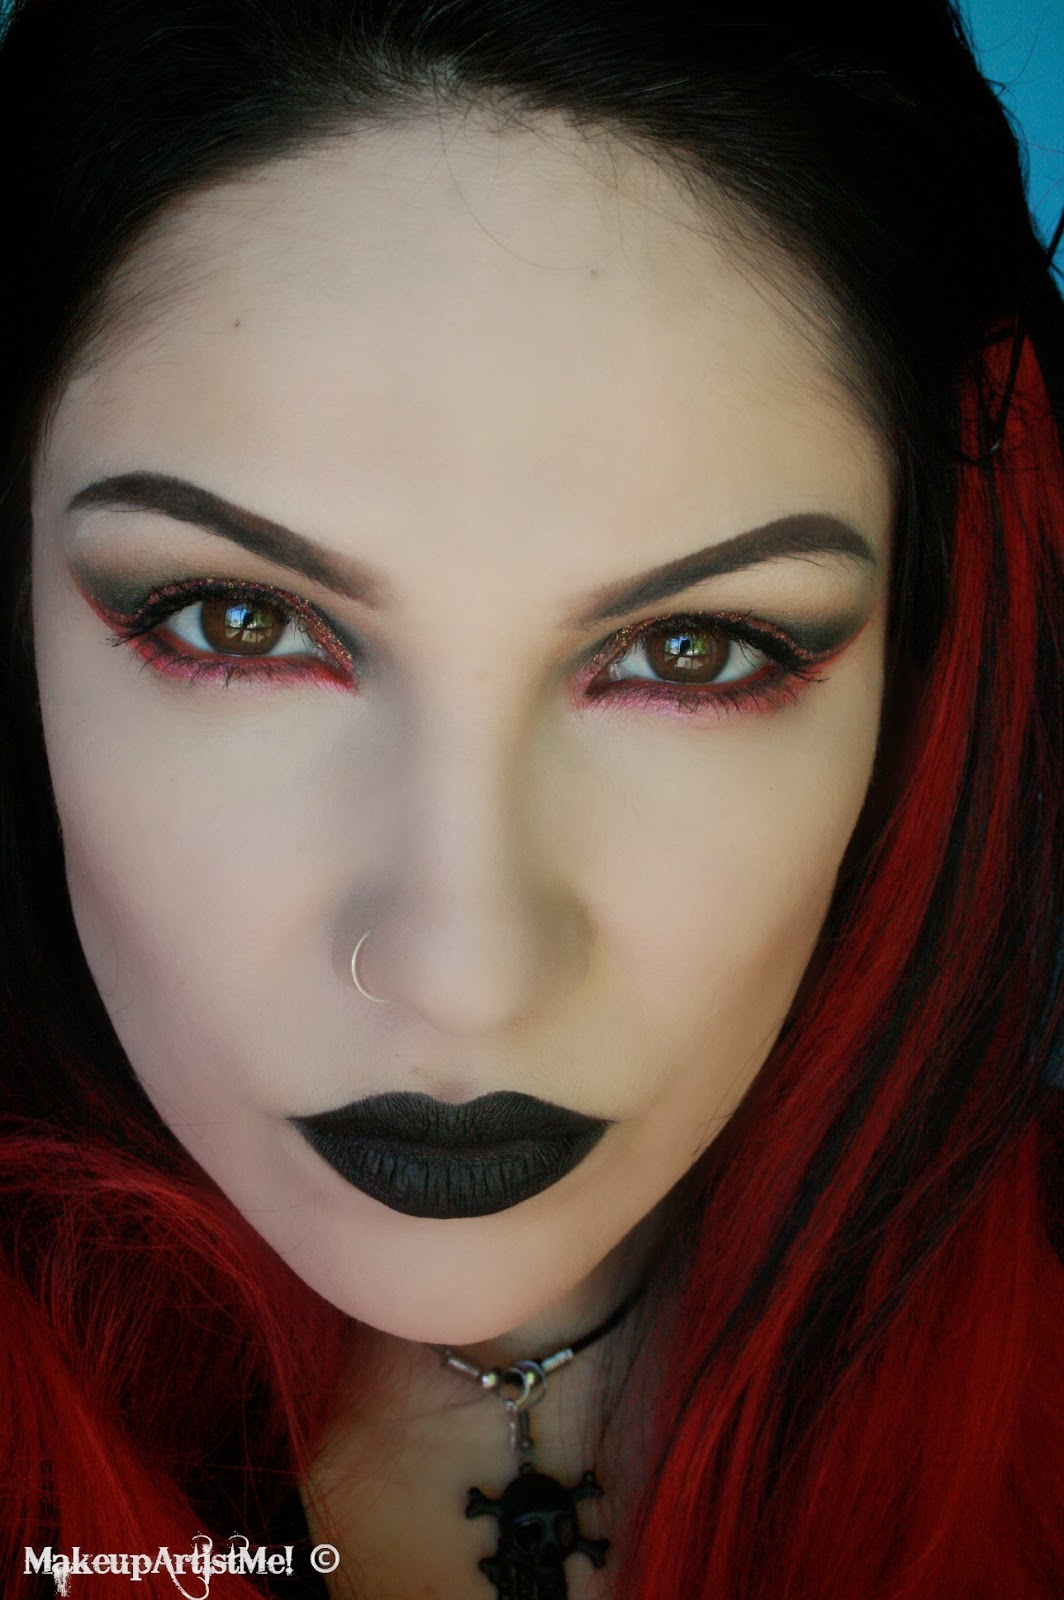 Gothic Wedding Makeup : Make-up Artist Me!: My Goth! Makeup Tutorial